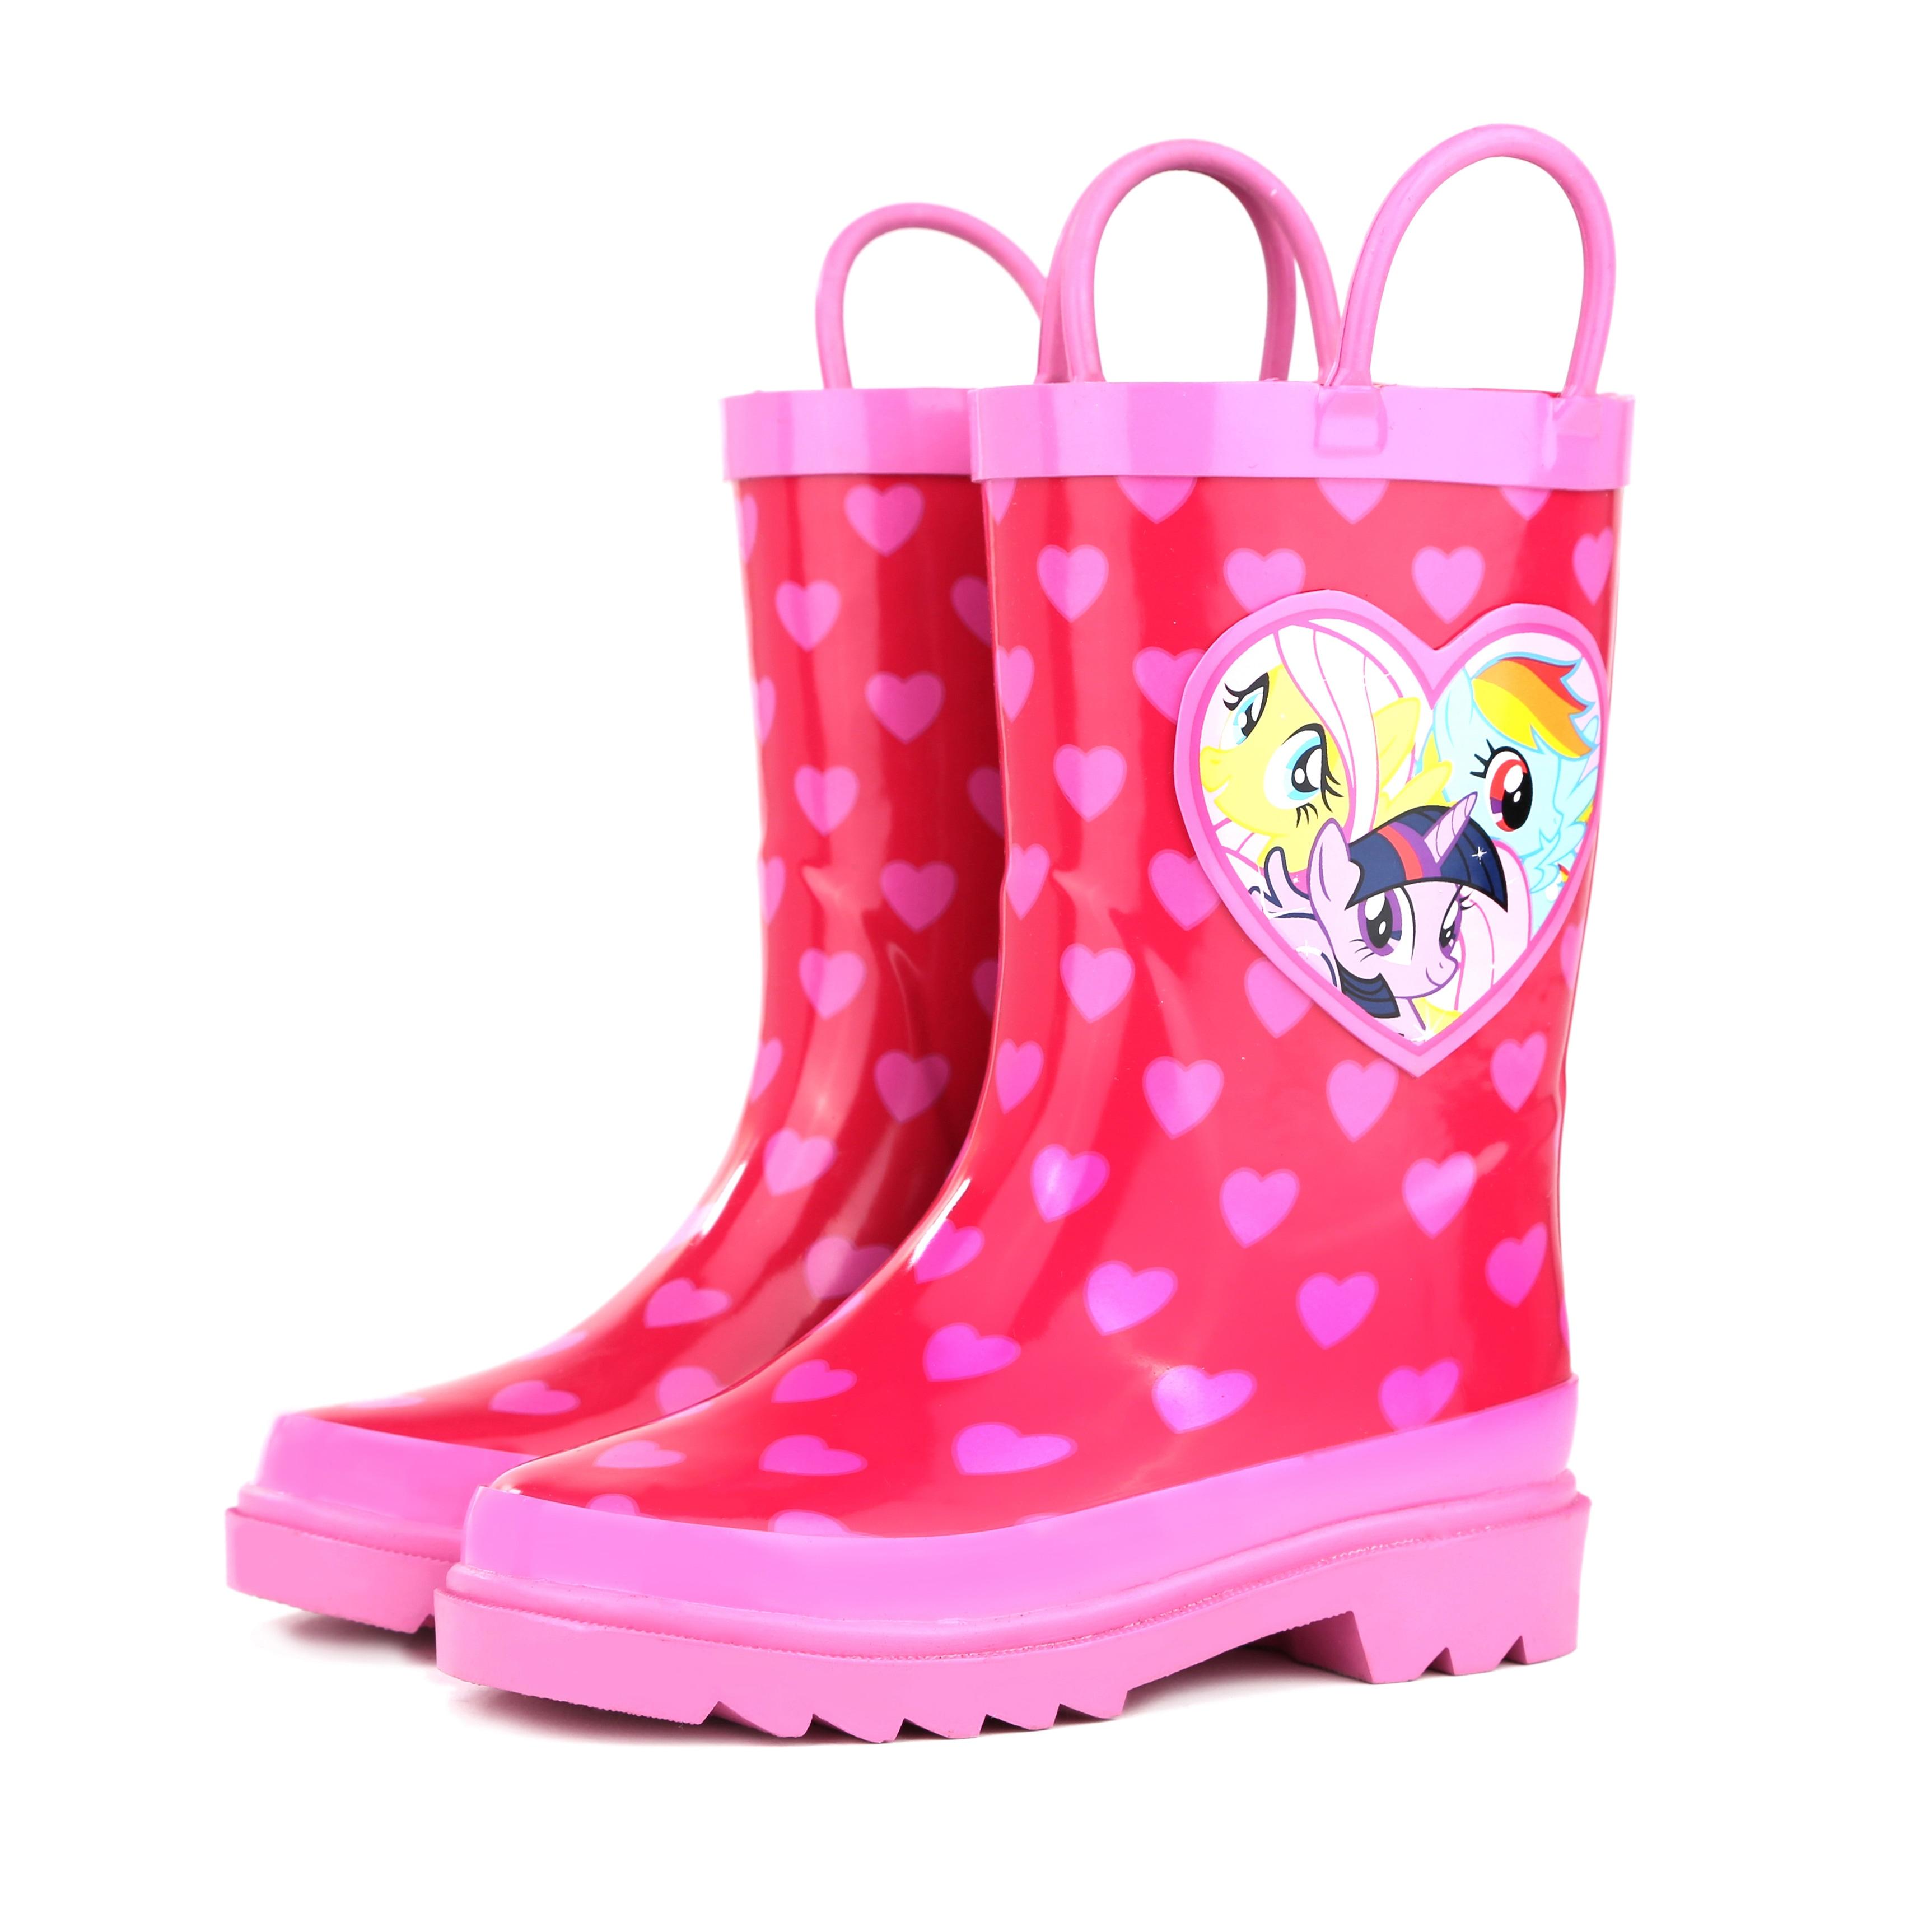 Foxfire Girls Pink Rainbow Unicorn Print Side Handle Rain Boots 11-3 Kids